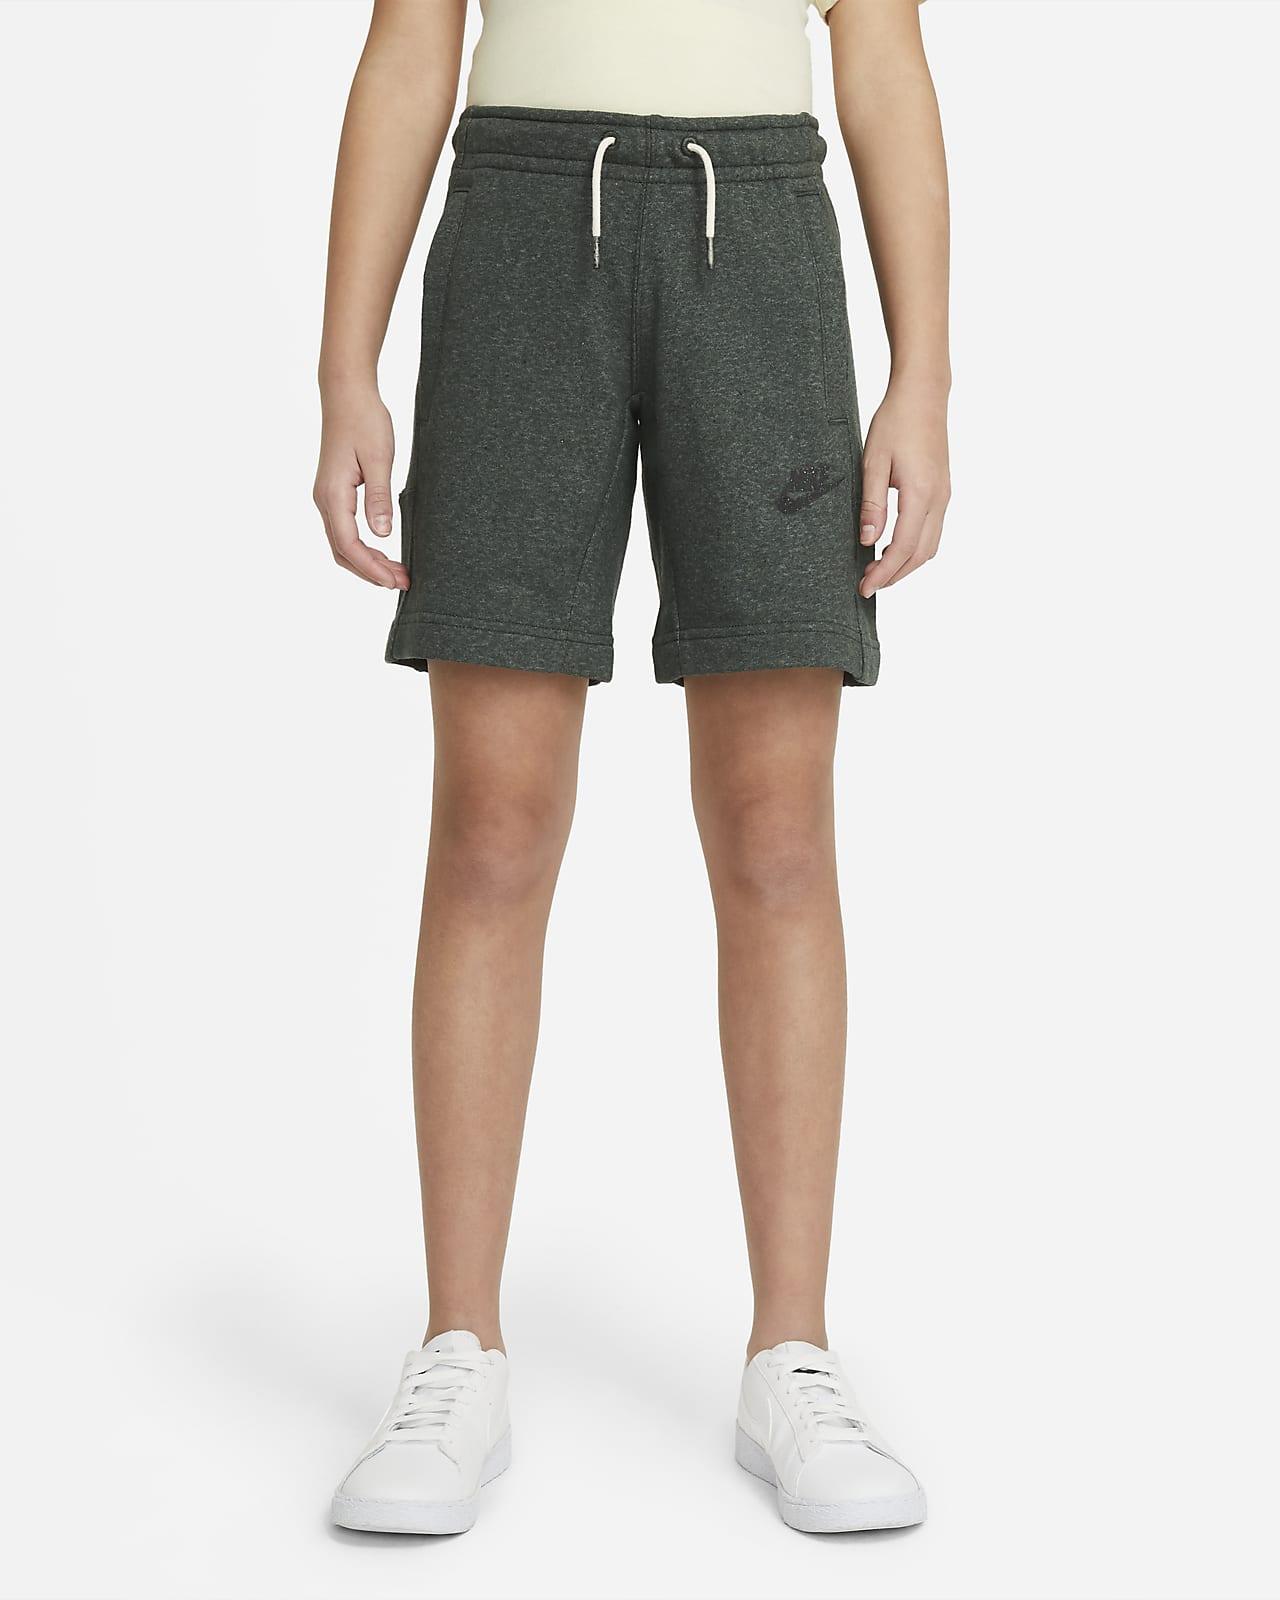 Nike Sportswear Genç Çocuk Şortu